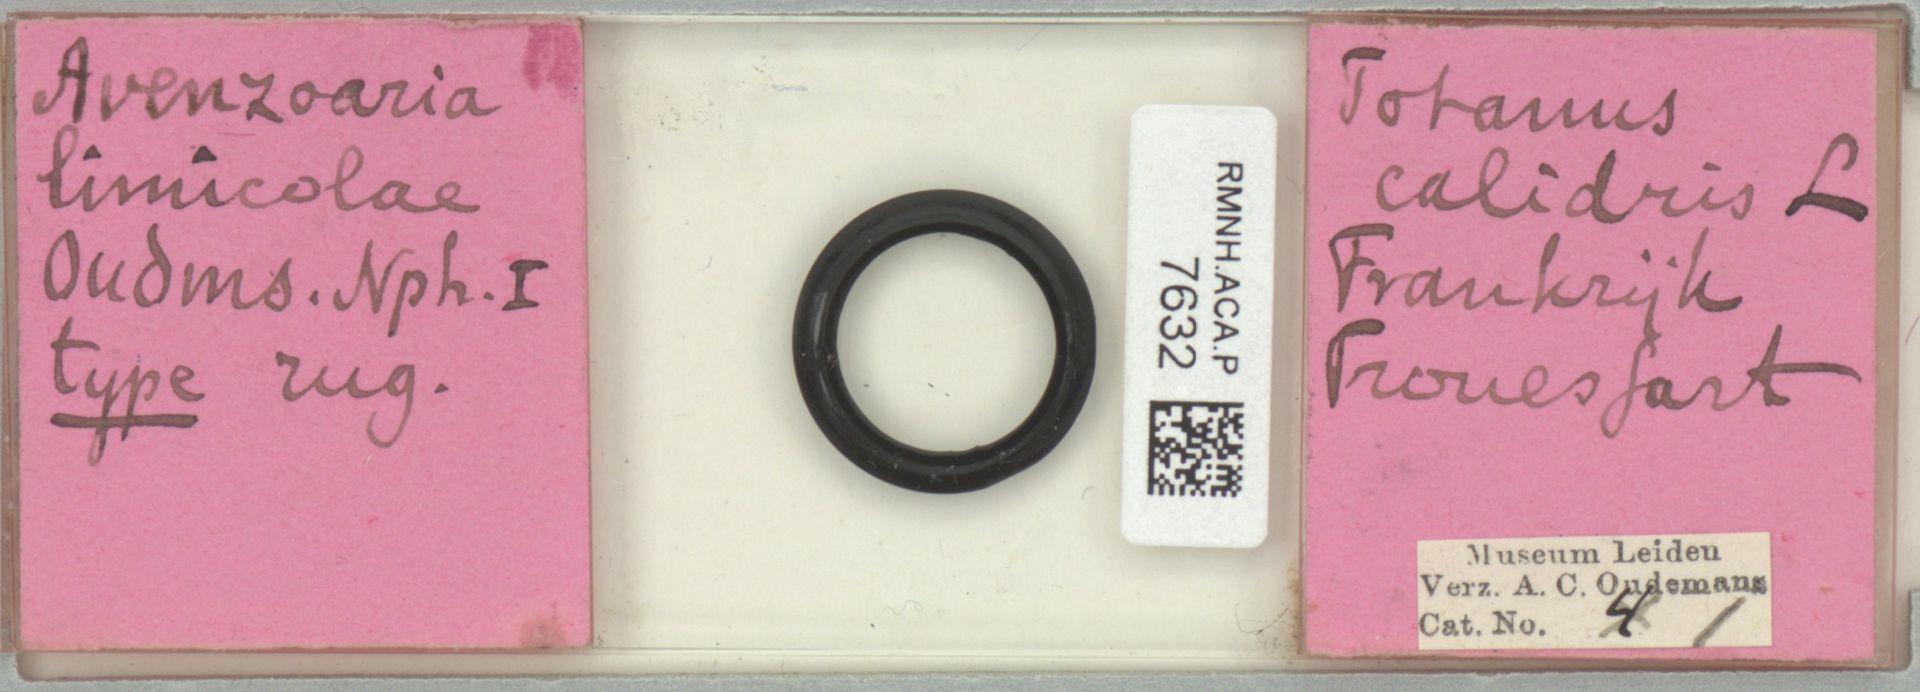 RMNH.ACA.P.7632   Avenzoaria limicolae Oudemans, 1904